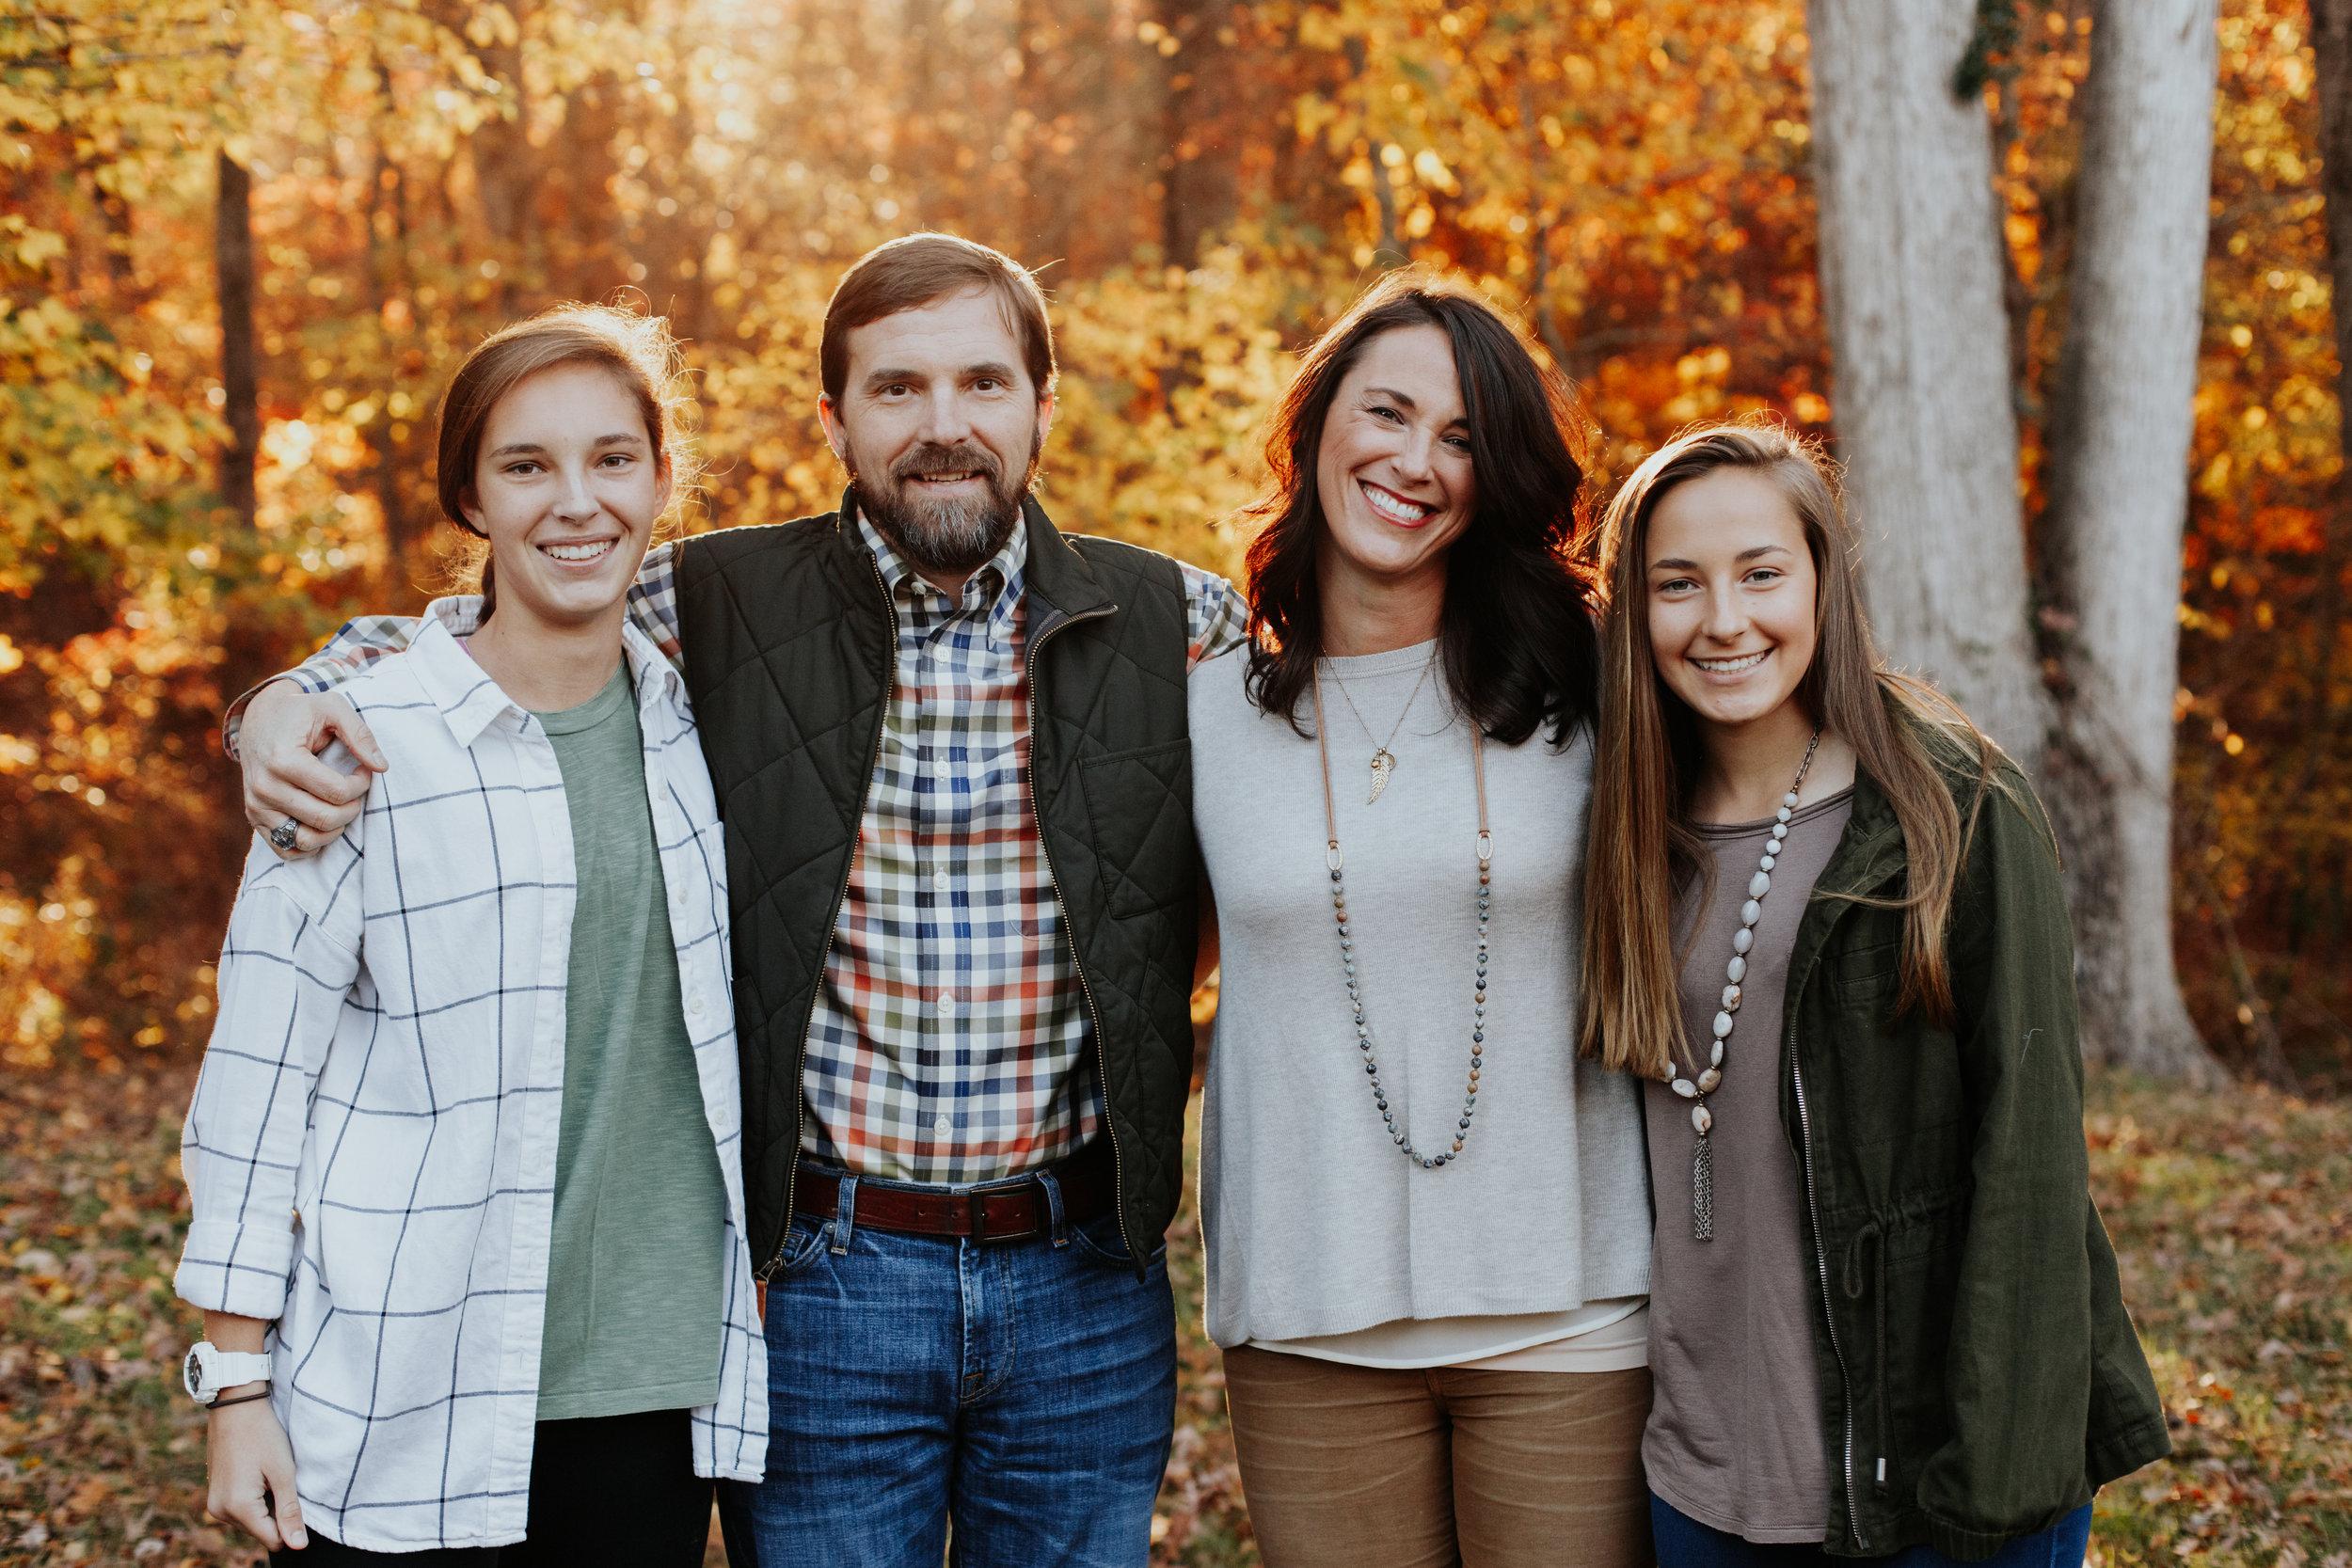 thedavisfamily-45.jpg